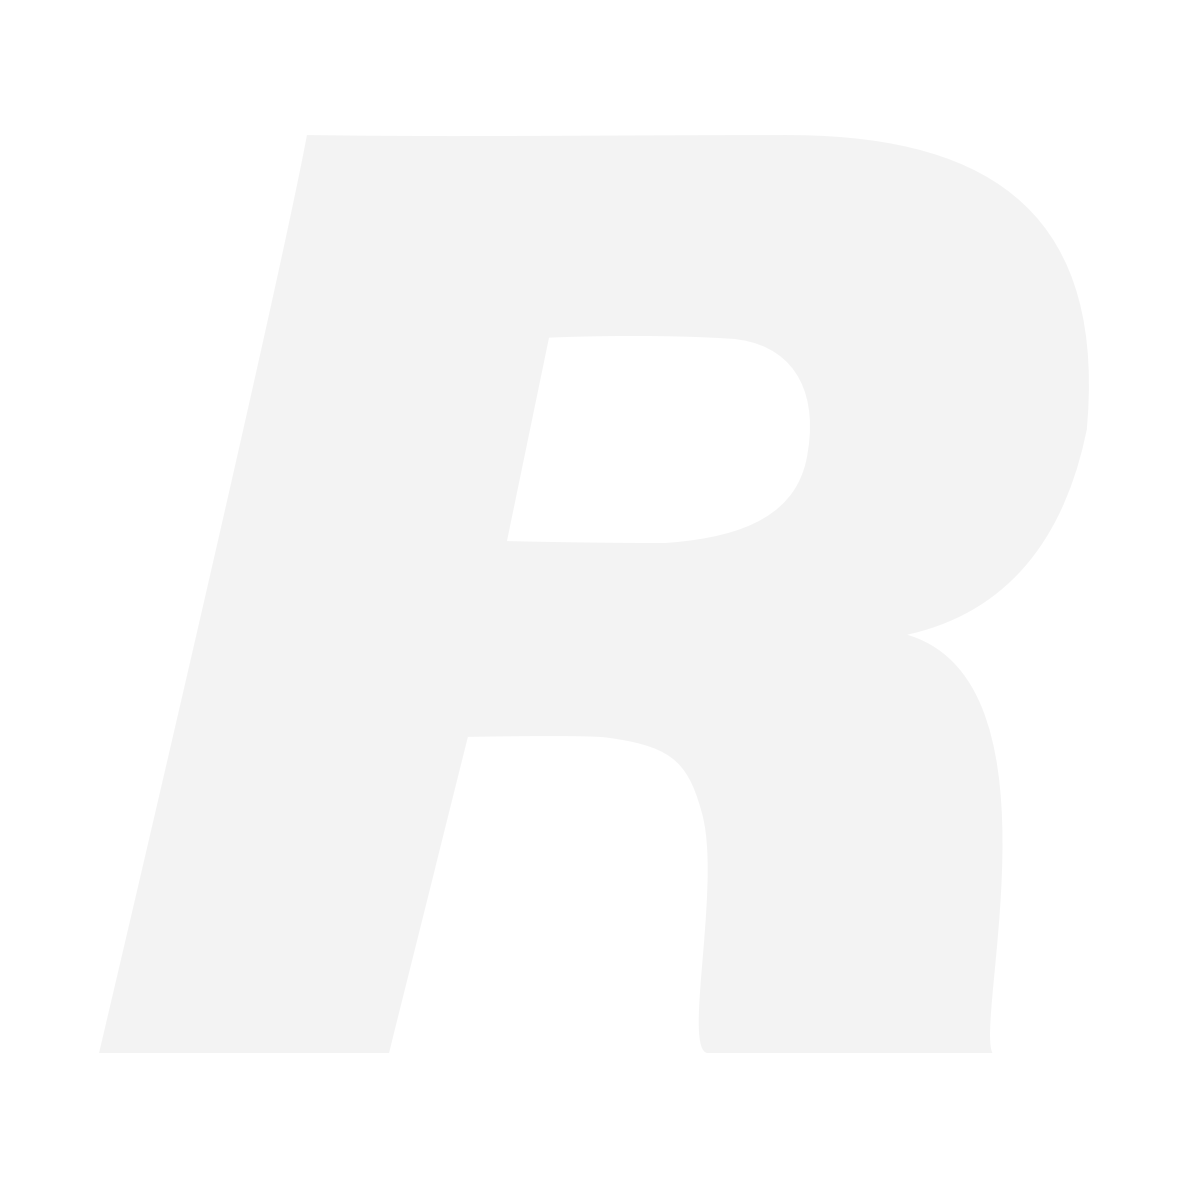 RAYNOX HD-5050PRO 0.5X -LAAJAKULMA-ADAPTERI KÄYTETTY